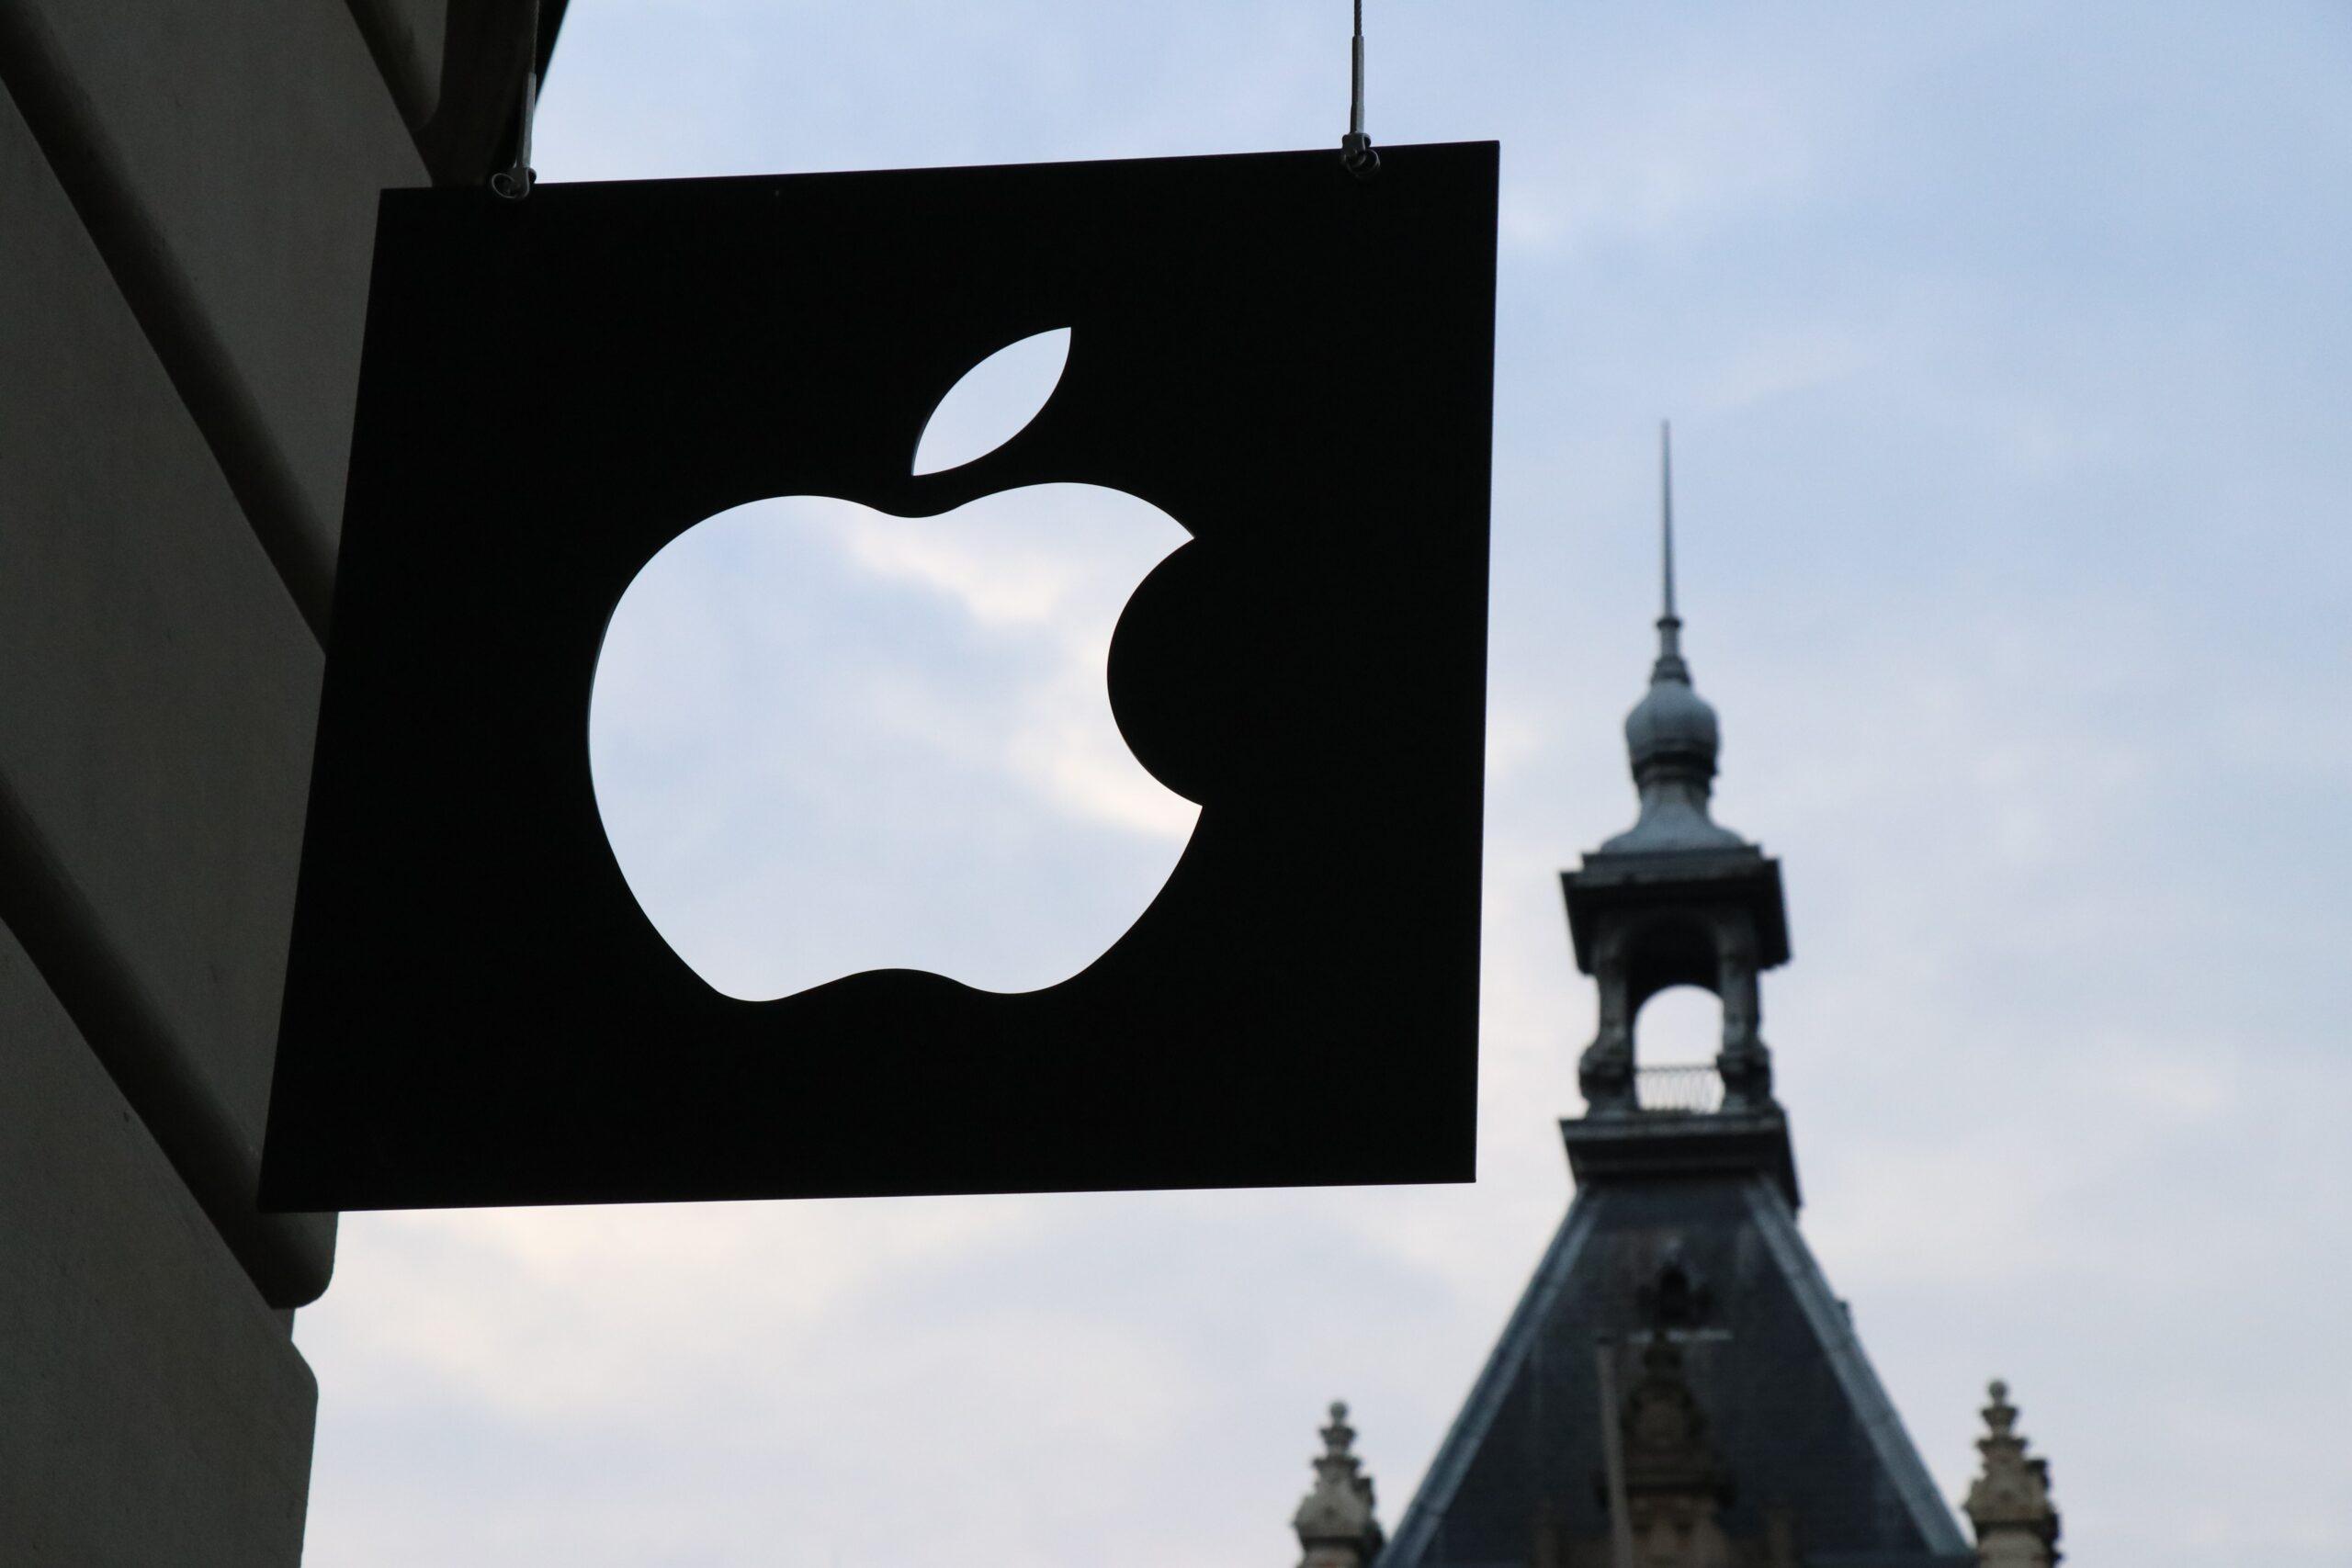 Kirklees Gaming Central | Apple Halves Commission Rate for Small App Developers After Court Battle